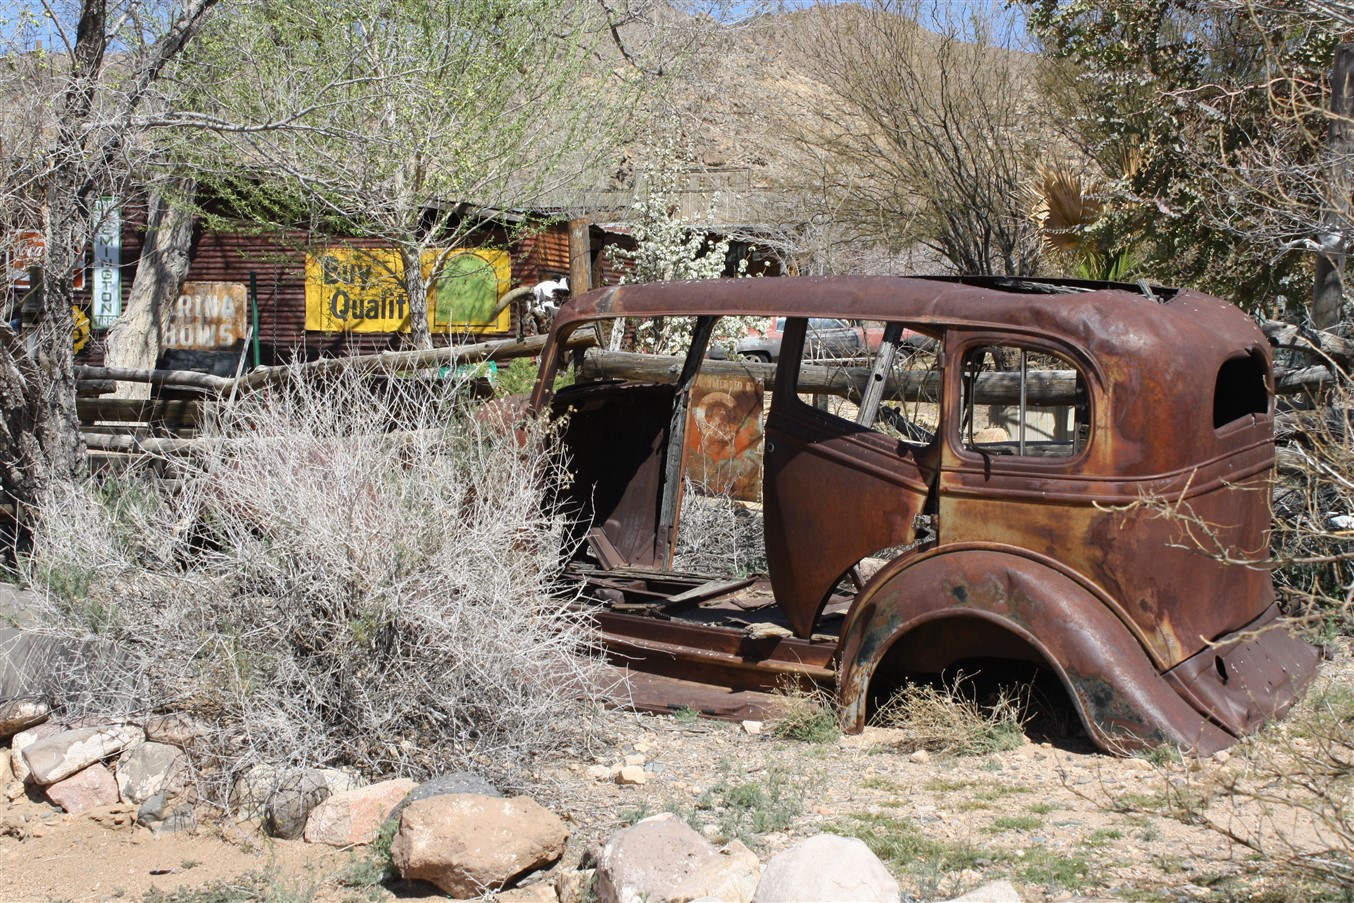 2012 03 14 Route 66 Road Trip 157 Hackberry Arizona.jpg